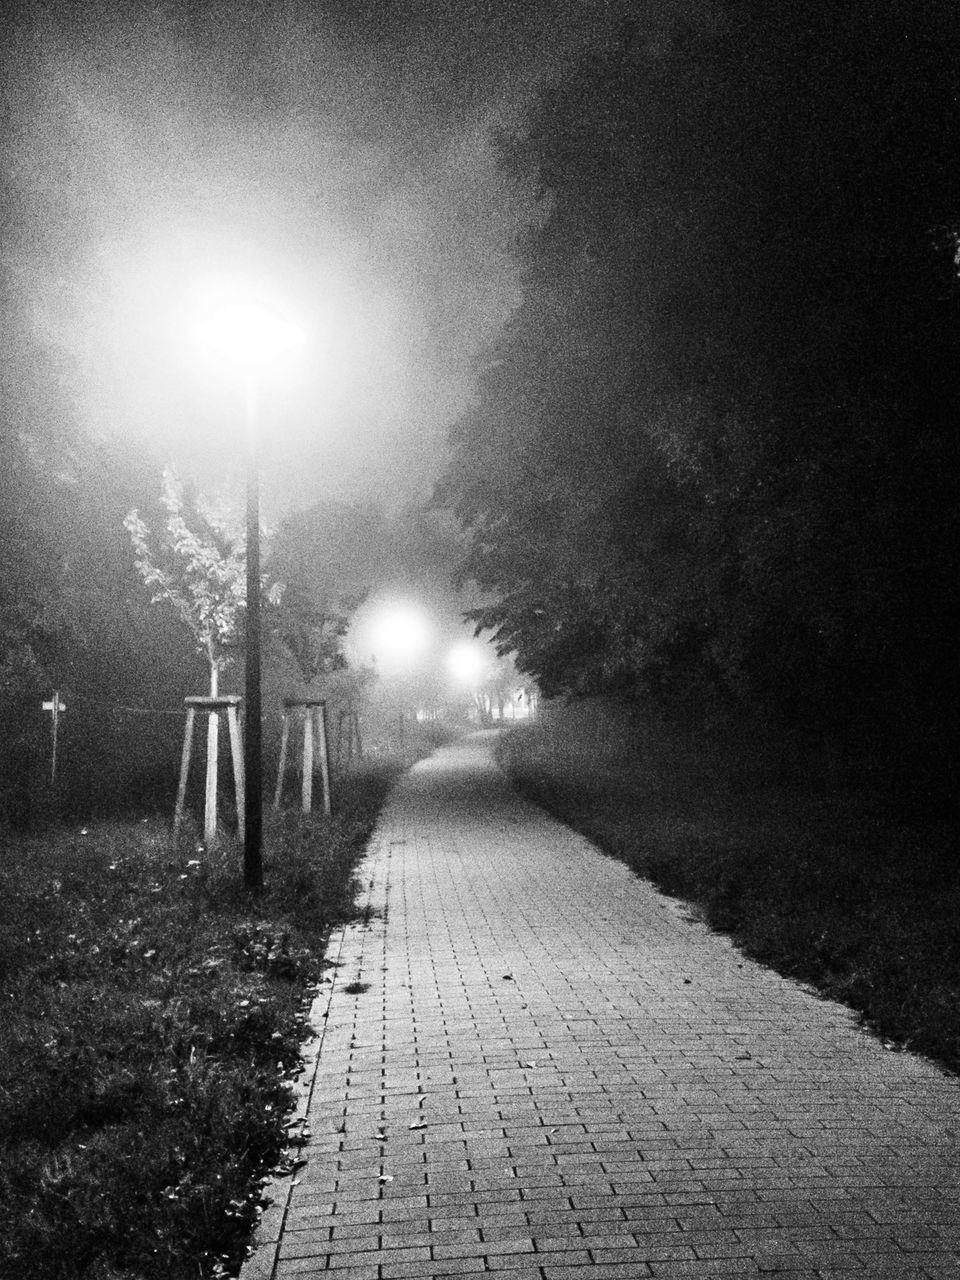 night, the way forward, illuminated, street light, tree, outdoors, no people, walkway, grass, nature